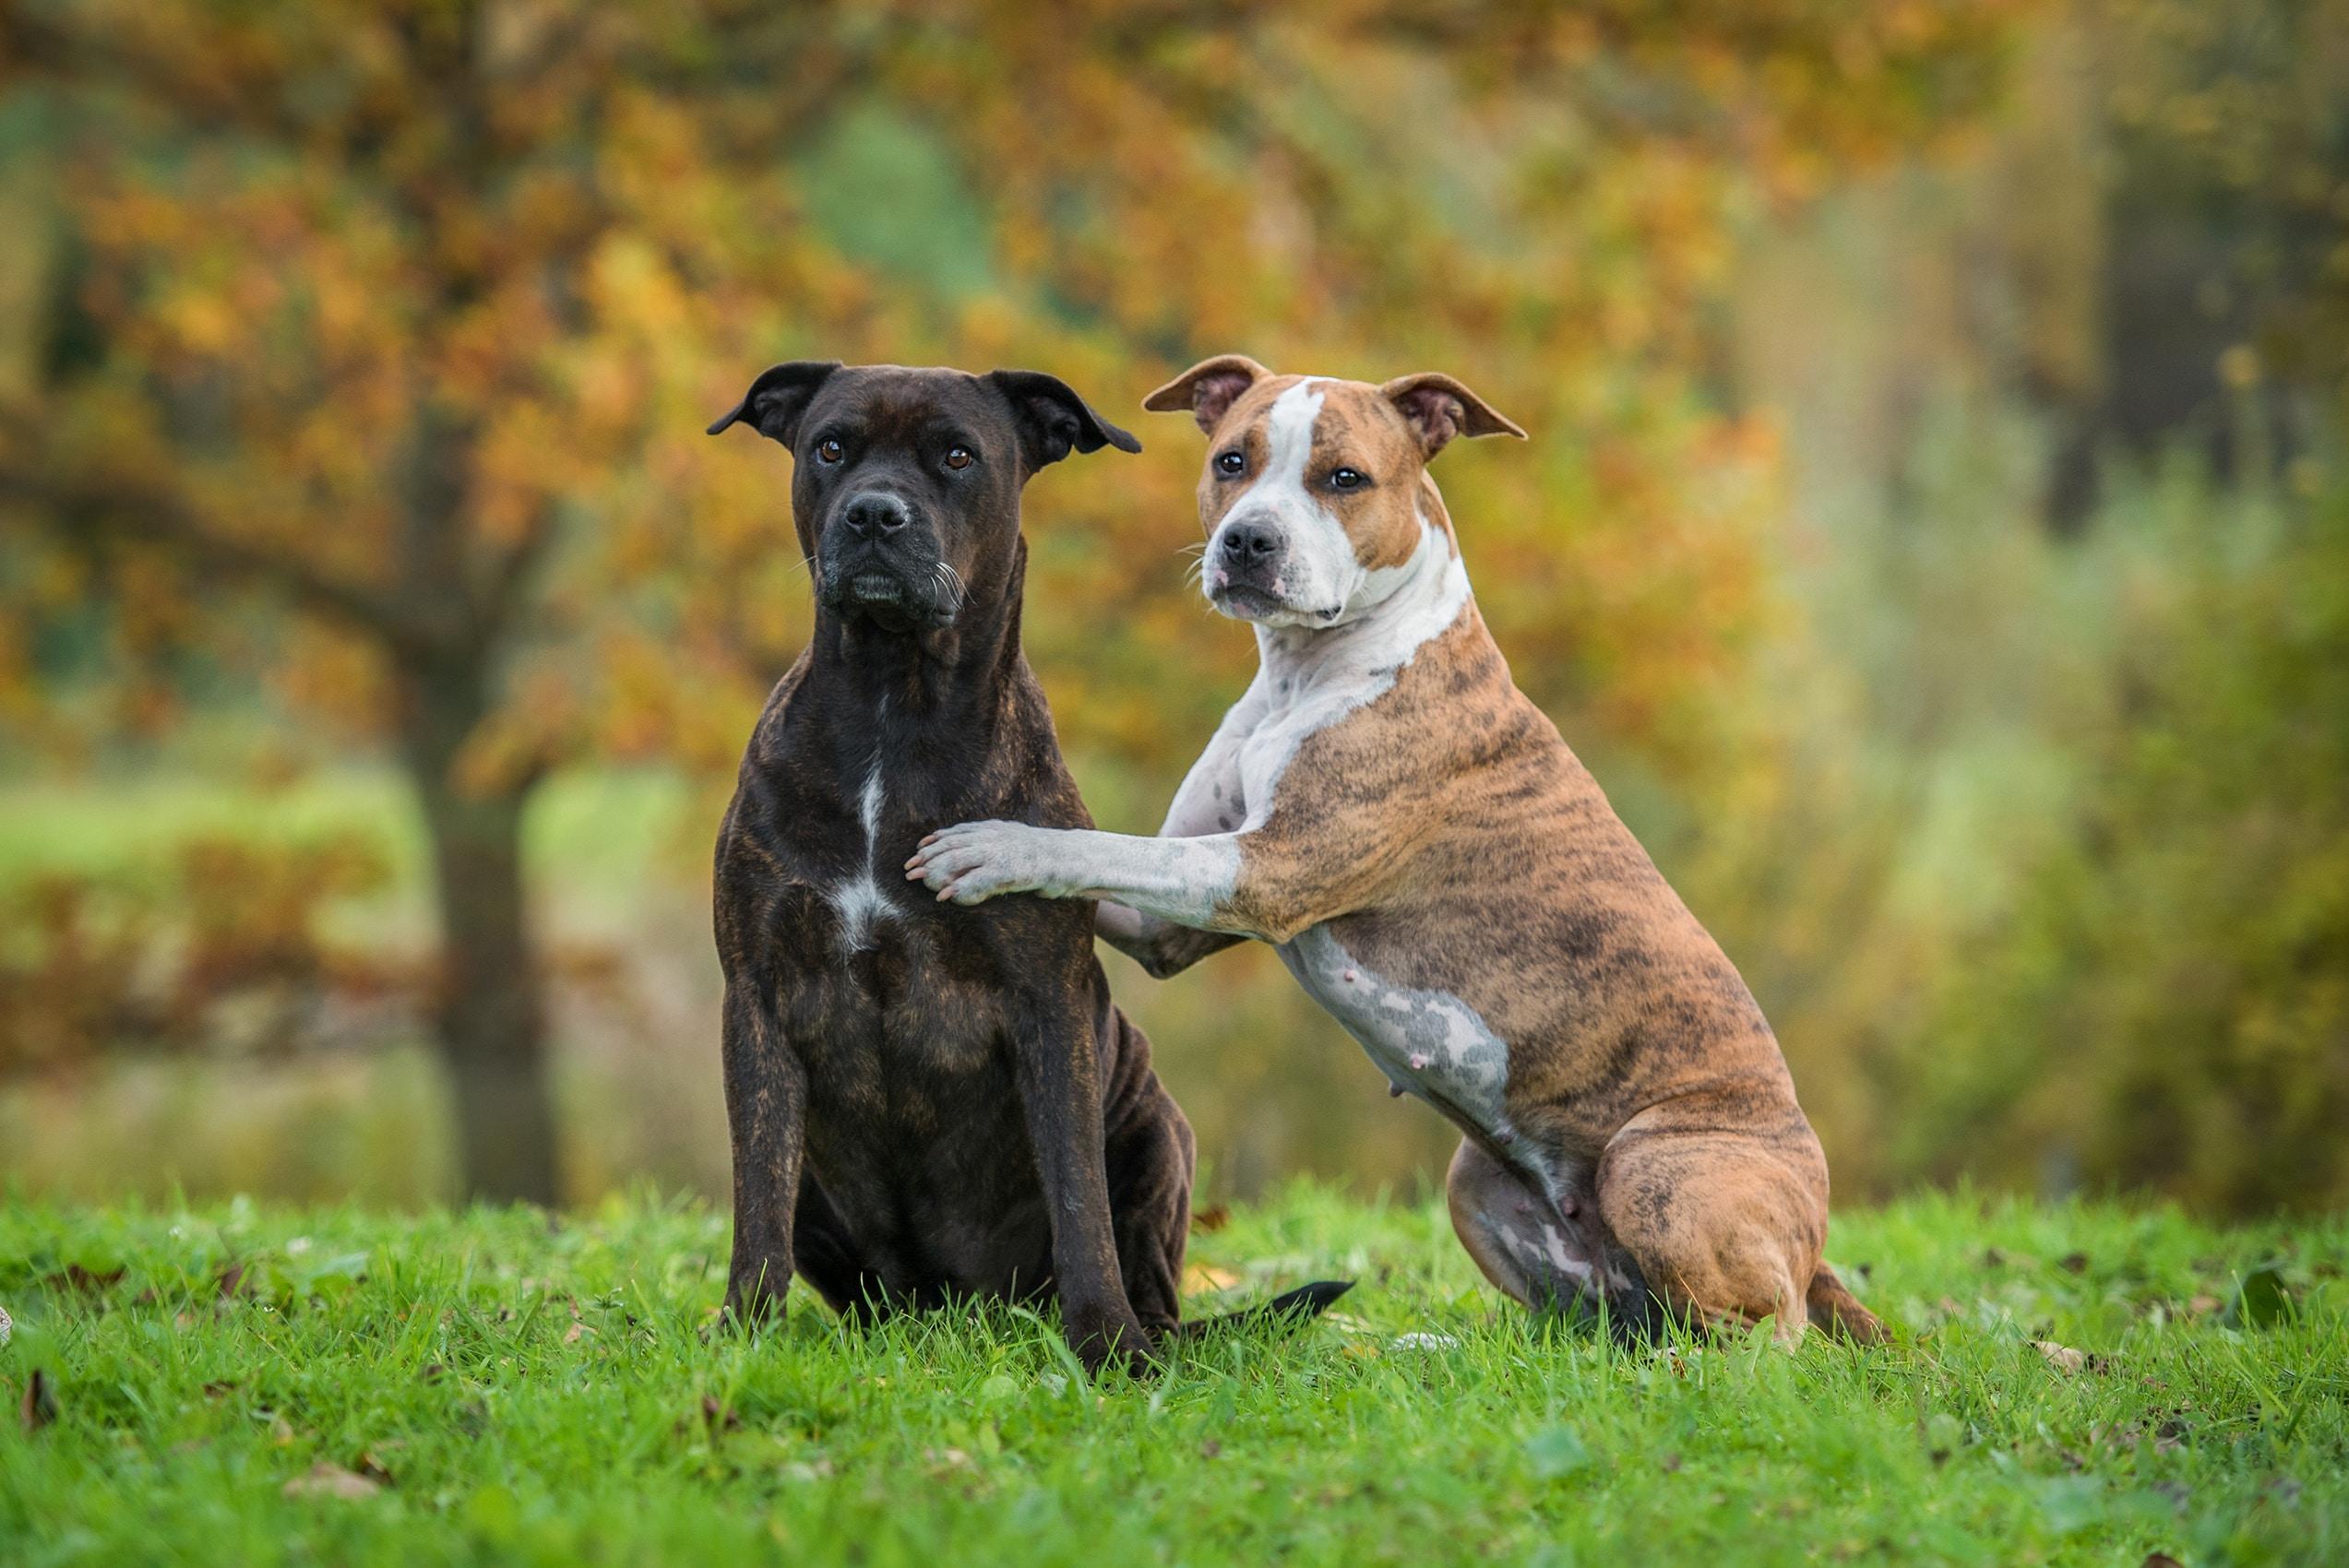 Zwei lustige American Staffordshire Terrier